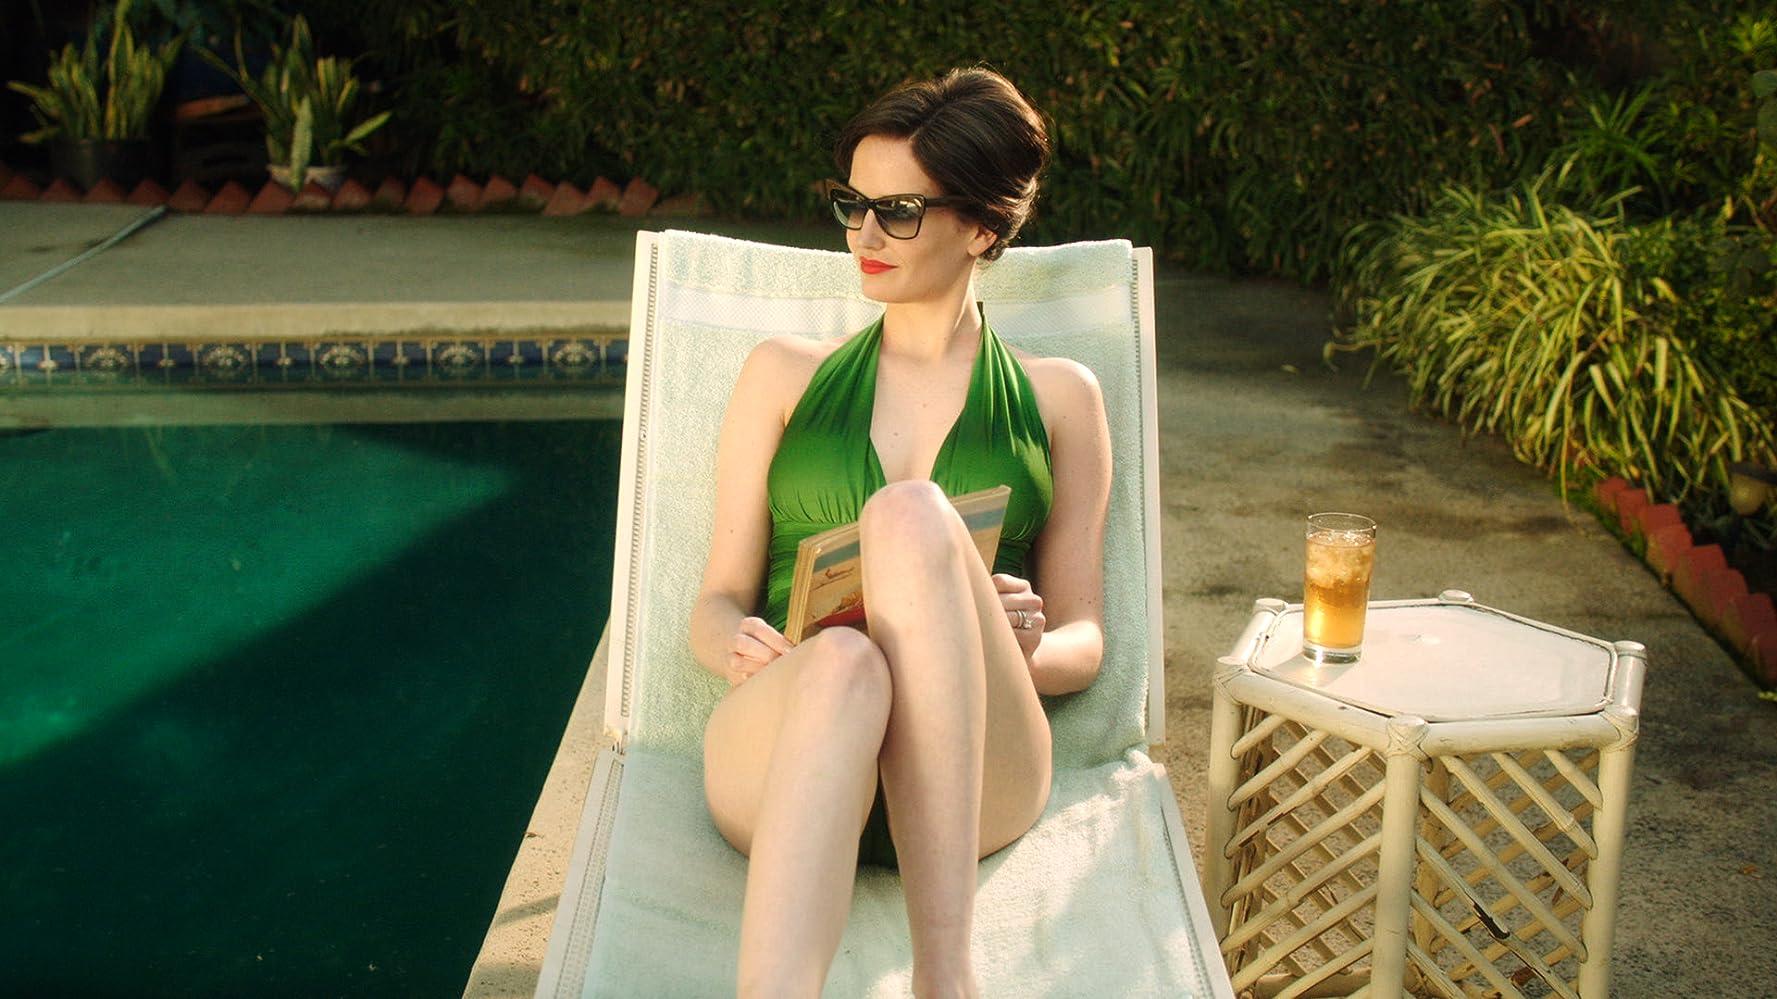 Eva green bikini pics